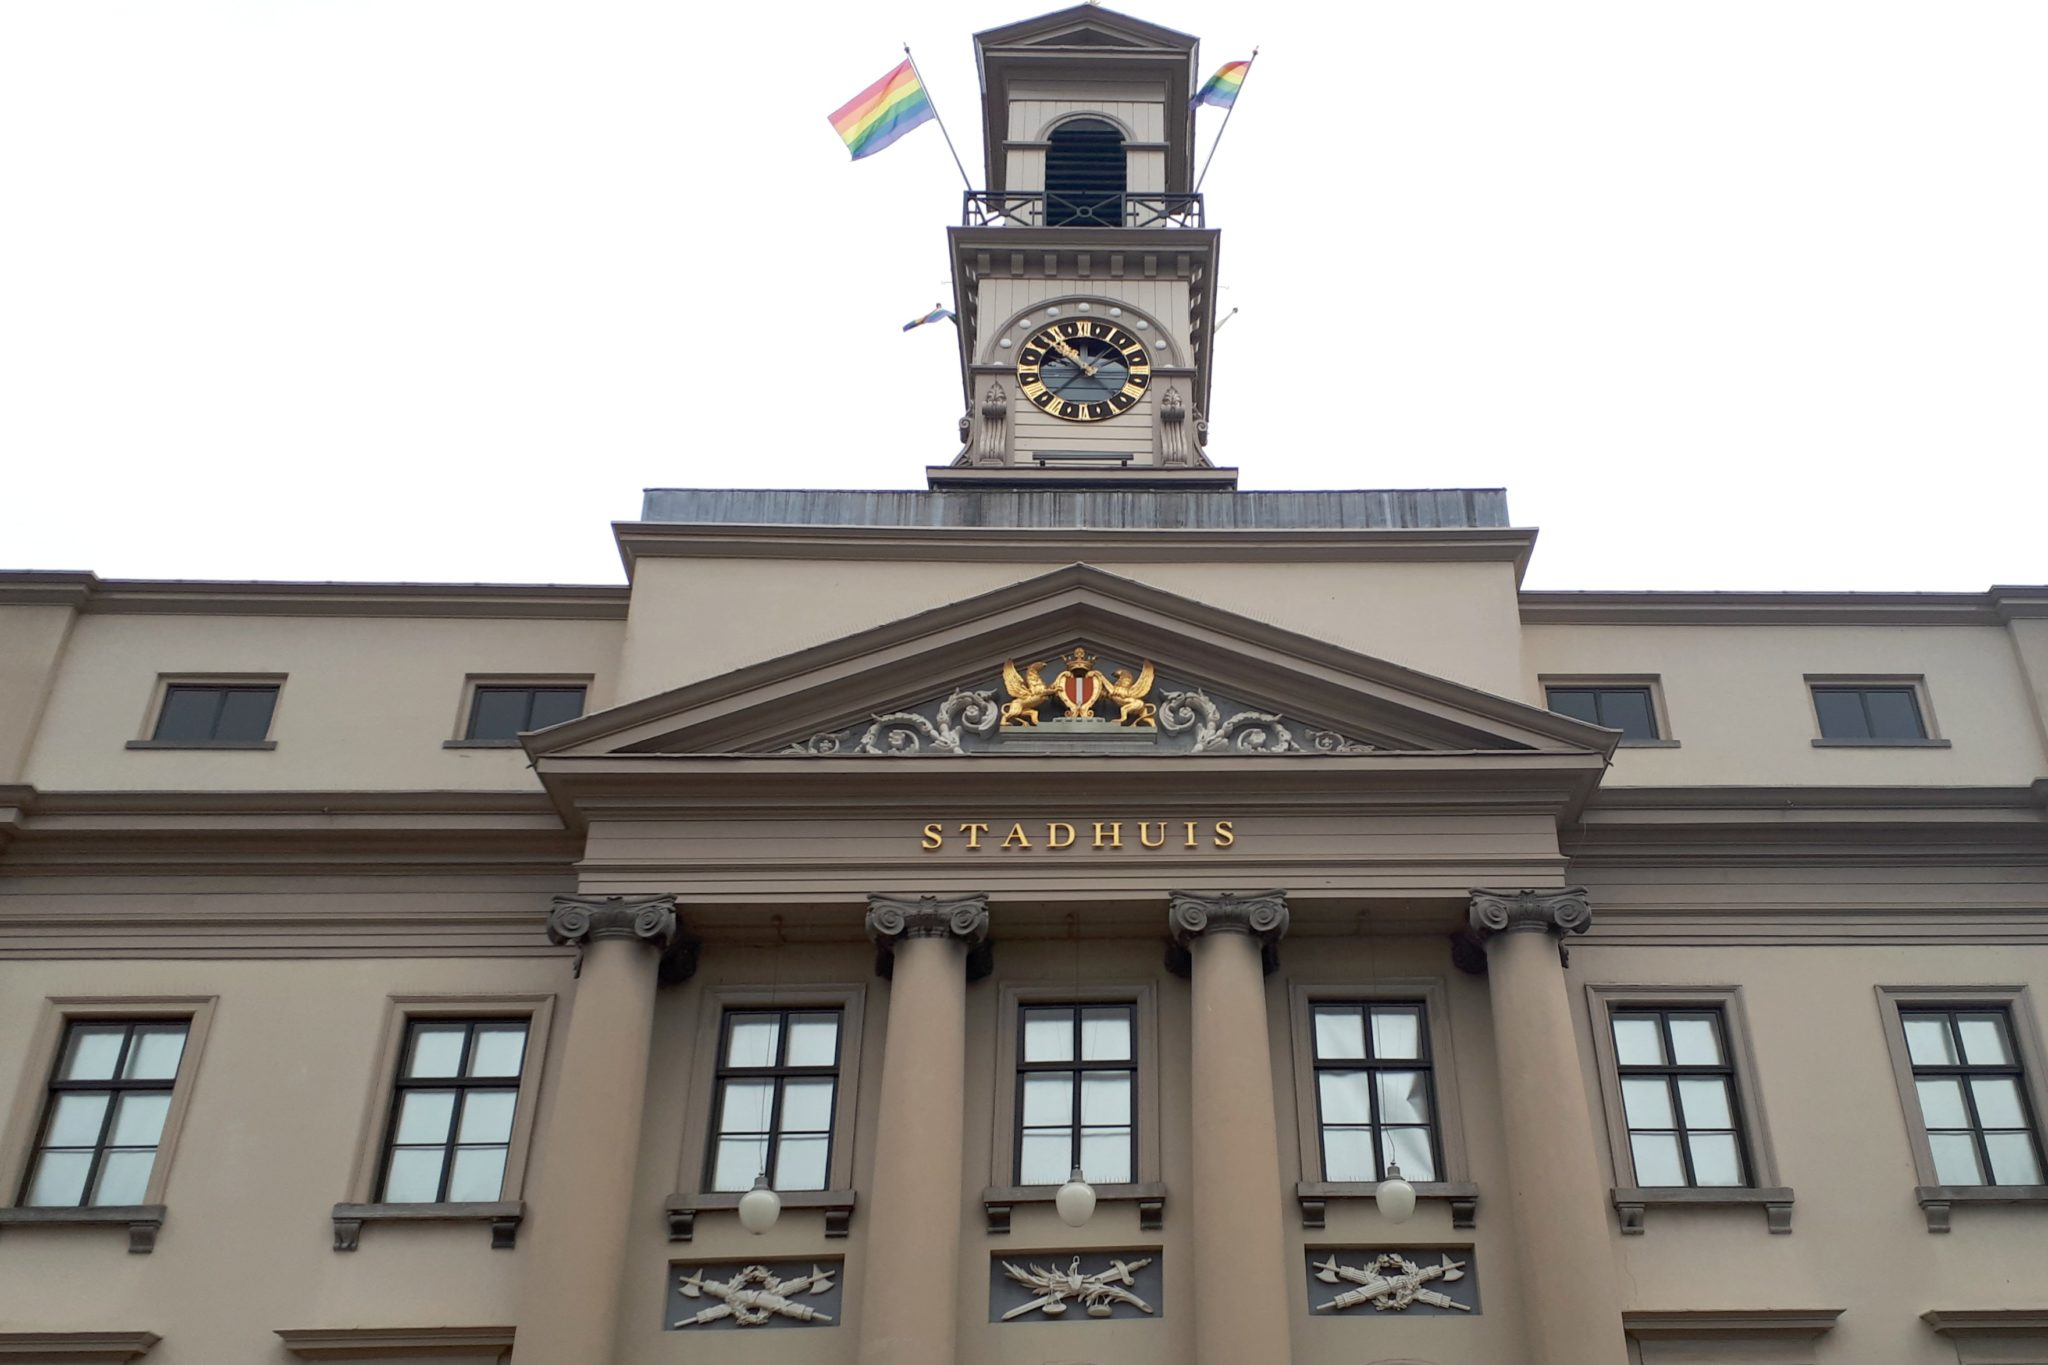 Regenboogvlaggen Coming Out Day Dordrecht Stadhuis - indebuurt Dordrecht